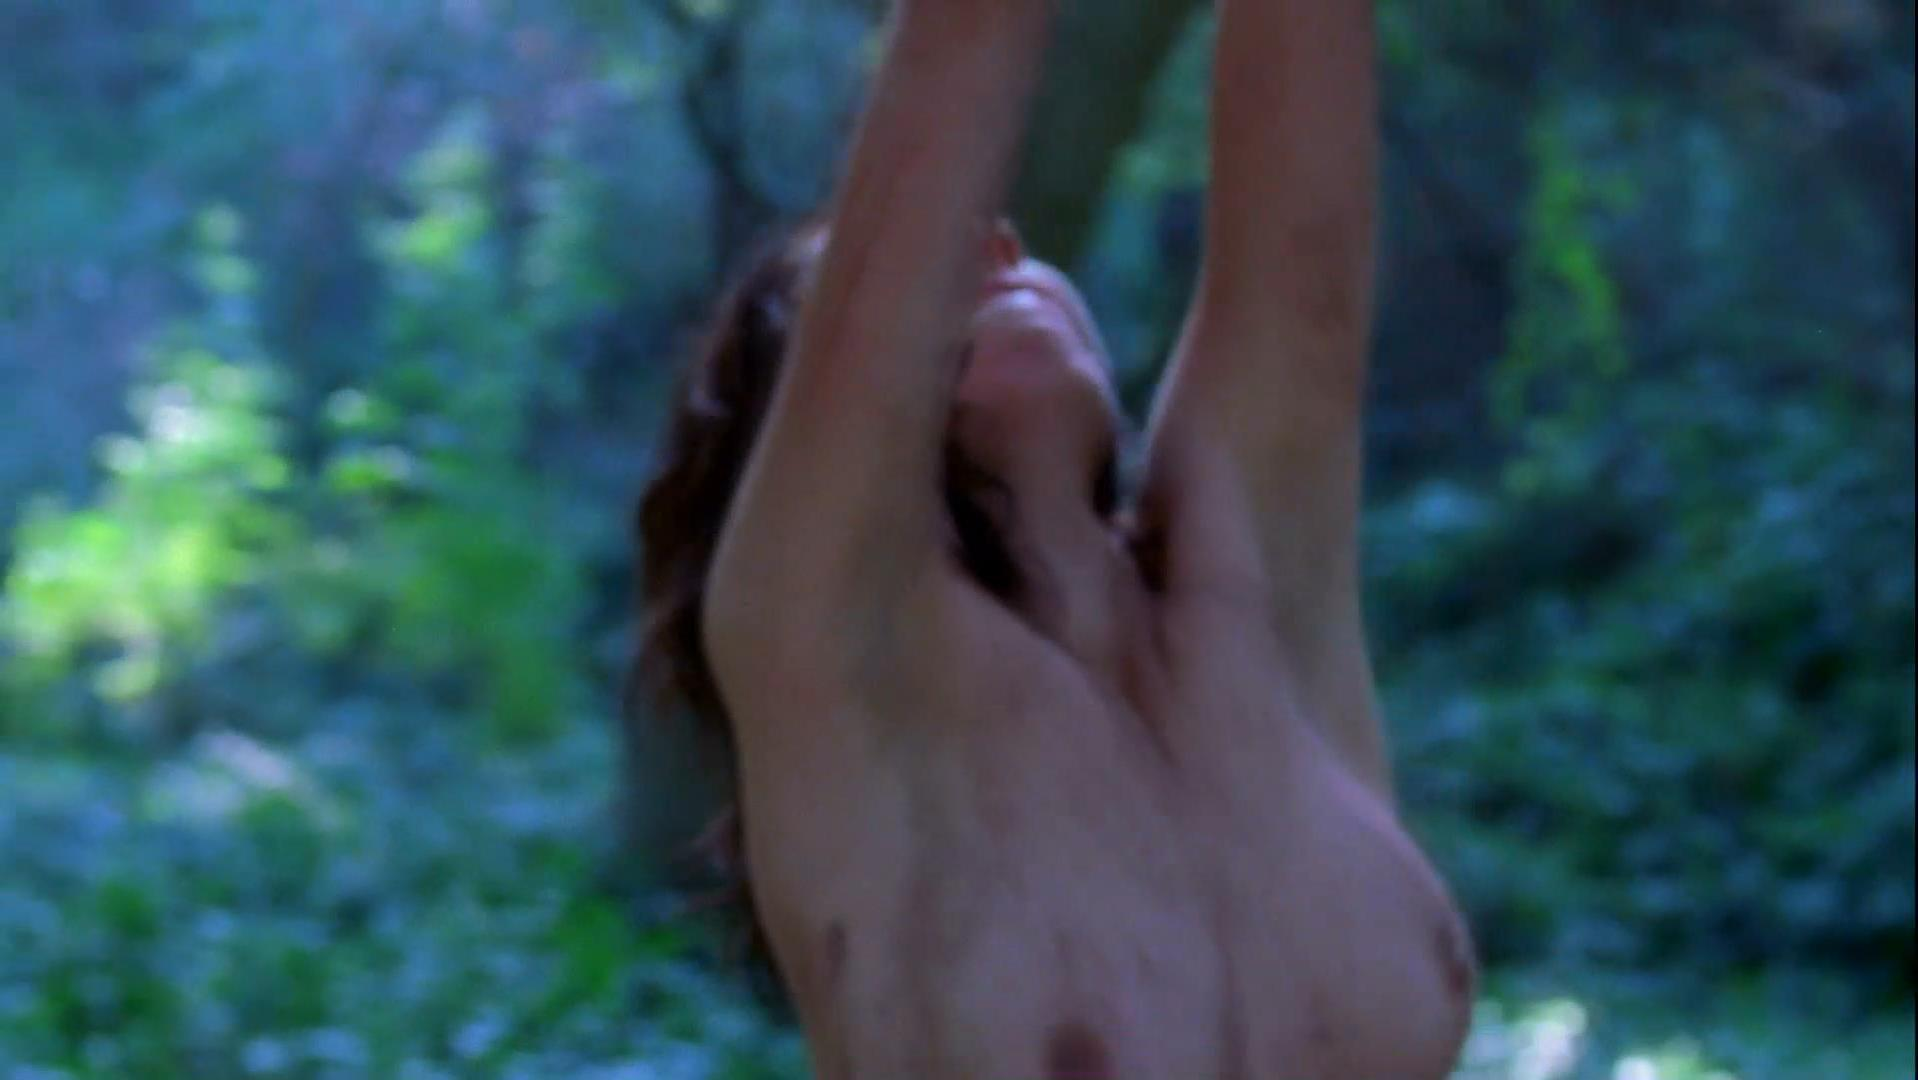 Tara Killian nude, Natalie Avital nude - Shallow Ground (2004)